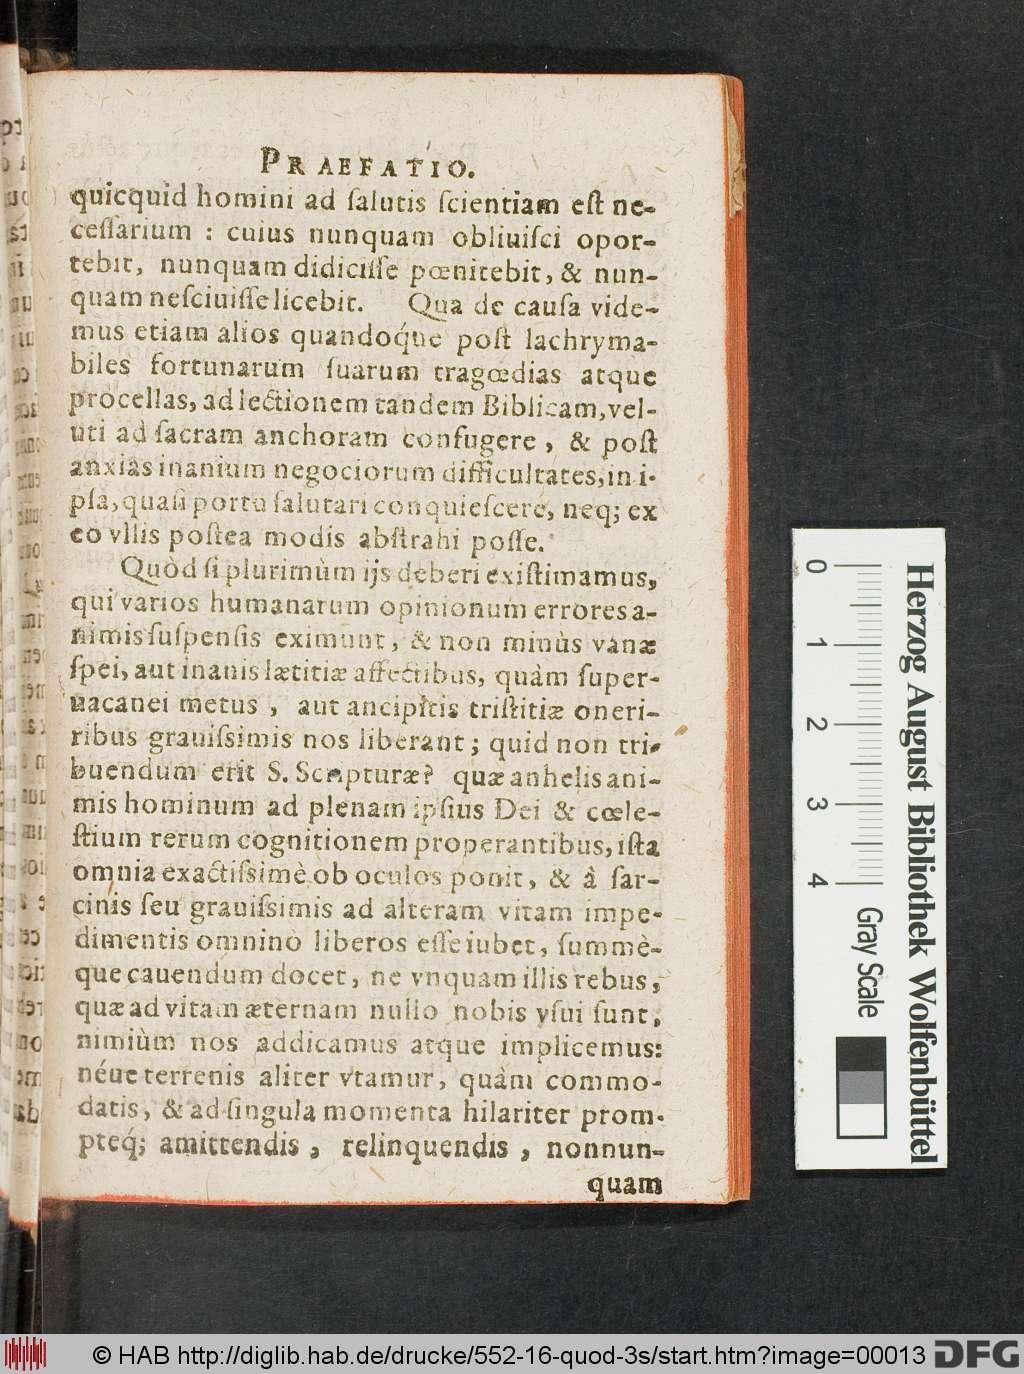 http://diglib.hab.de/drucke/552-16-quod-3s/00013.jpg